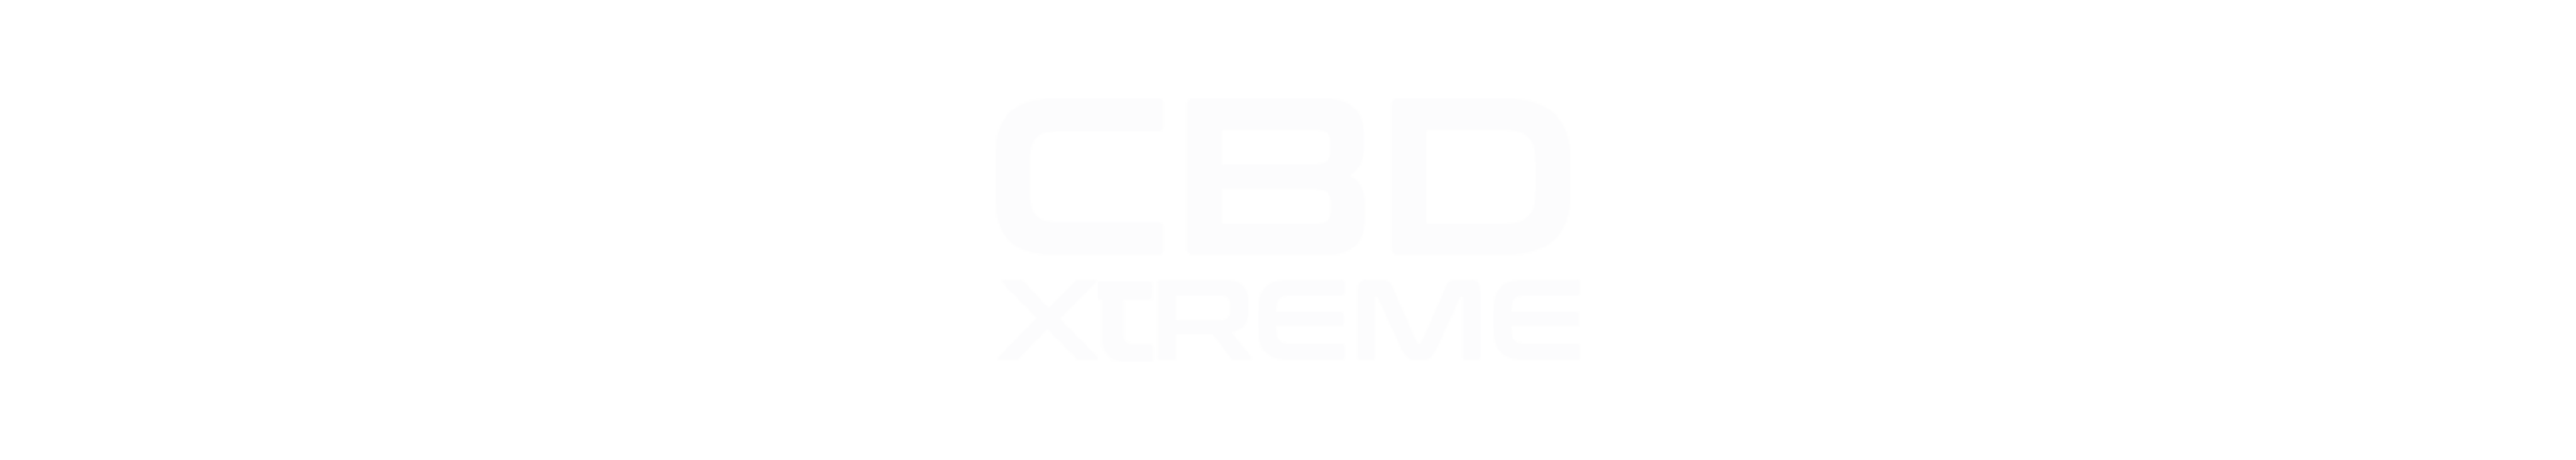 CBD Xtreme